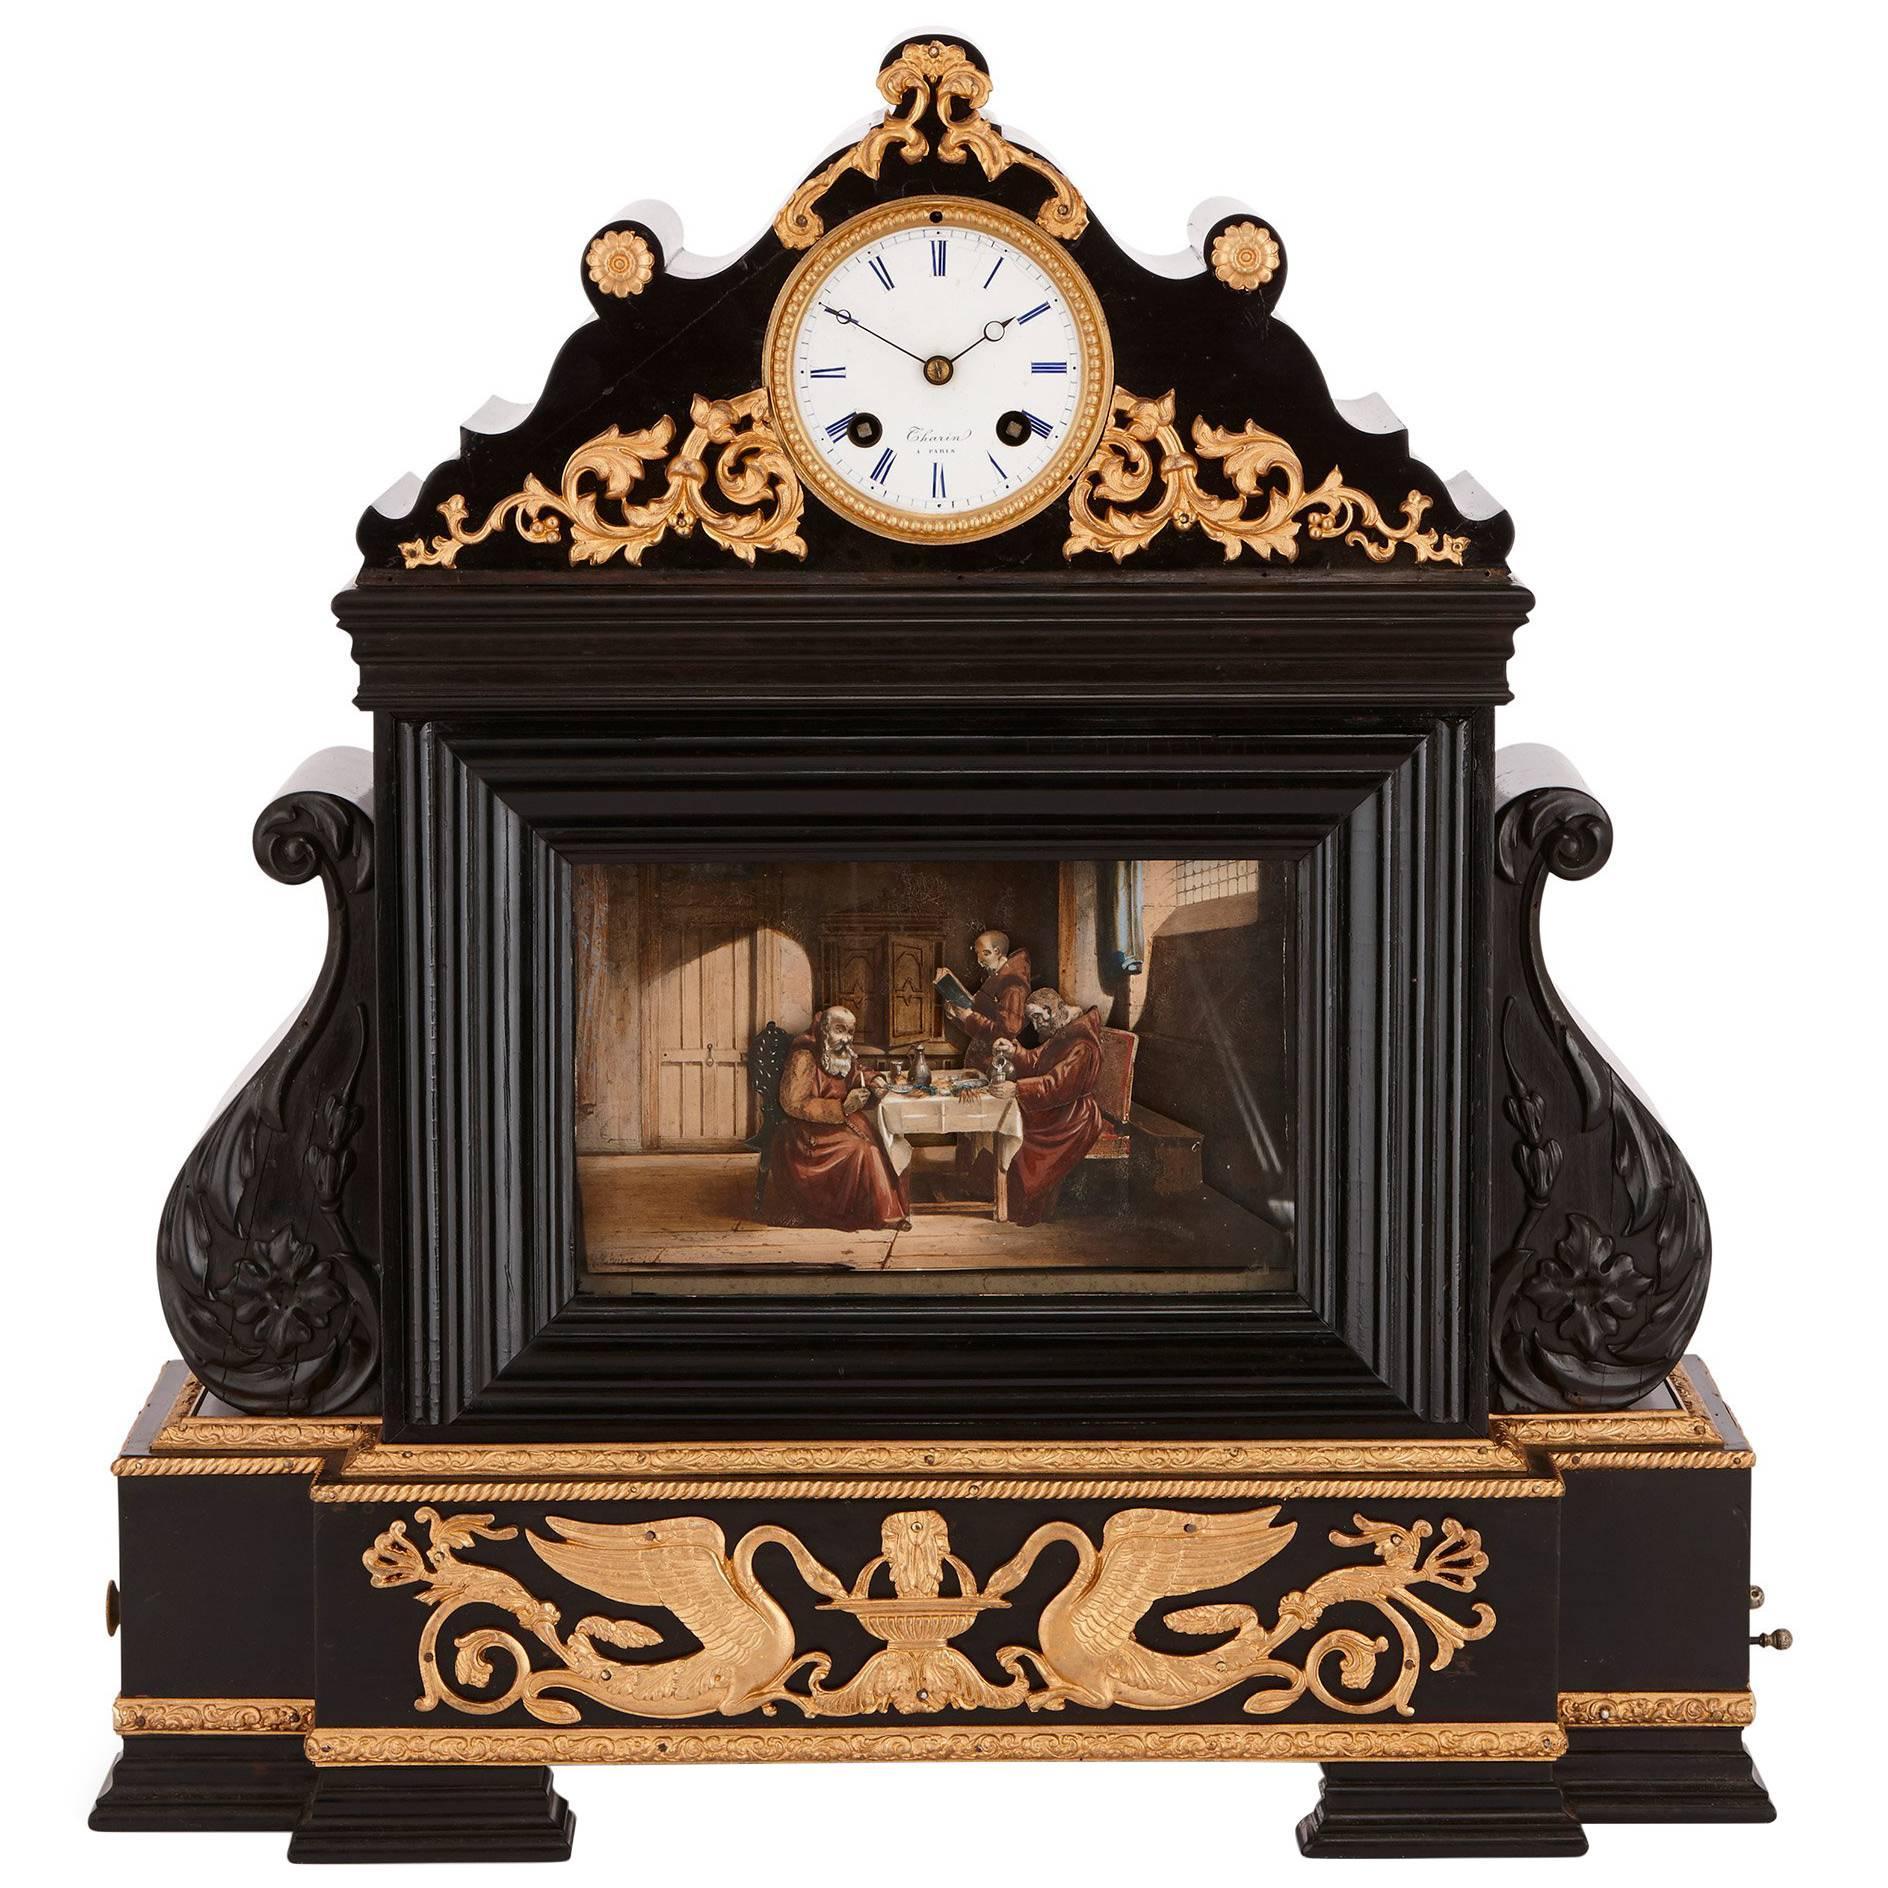 19th Century French musical automaton clock